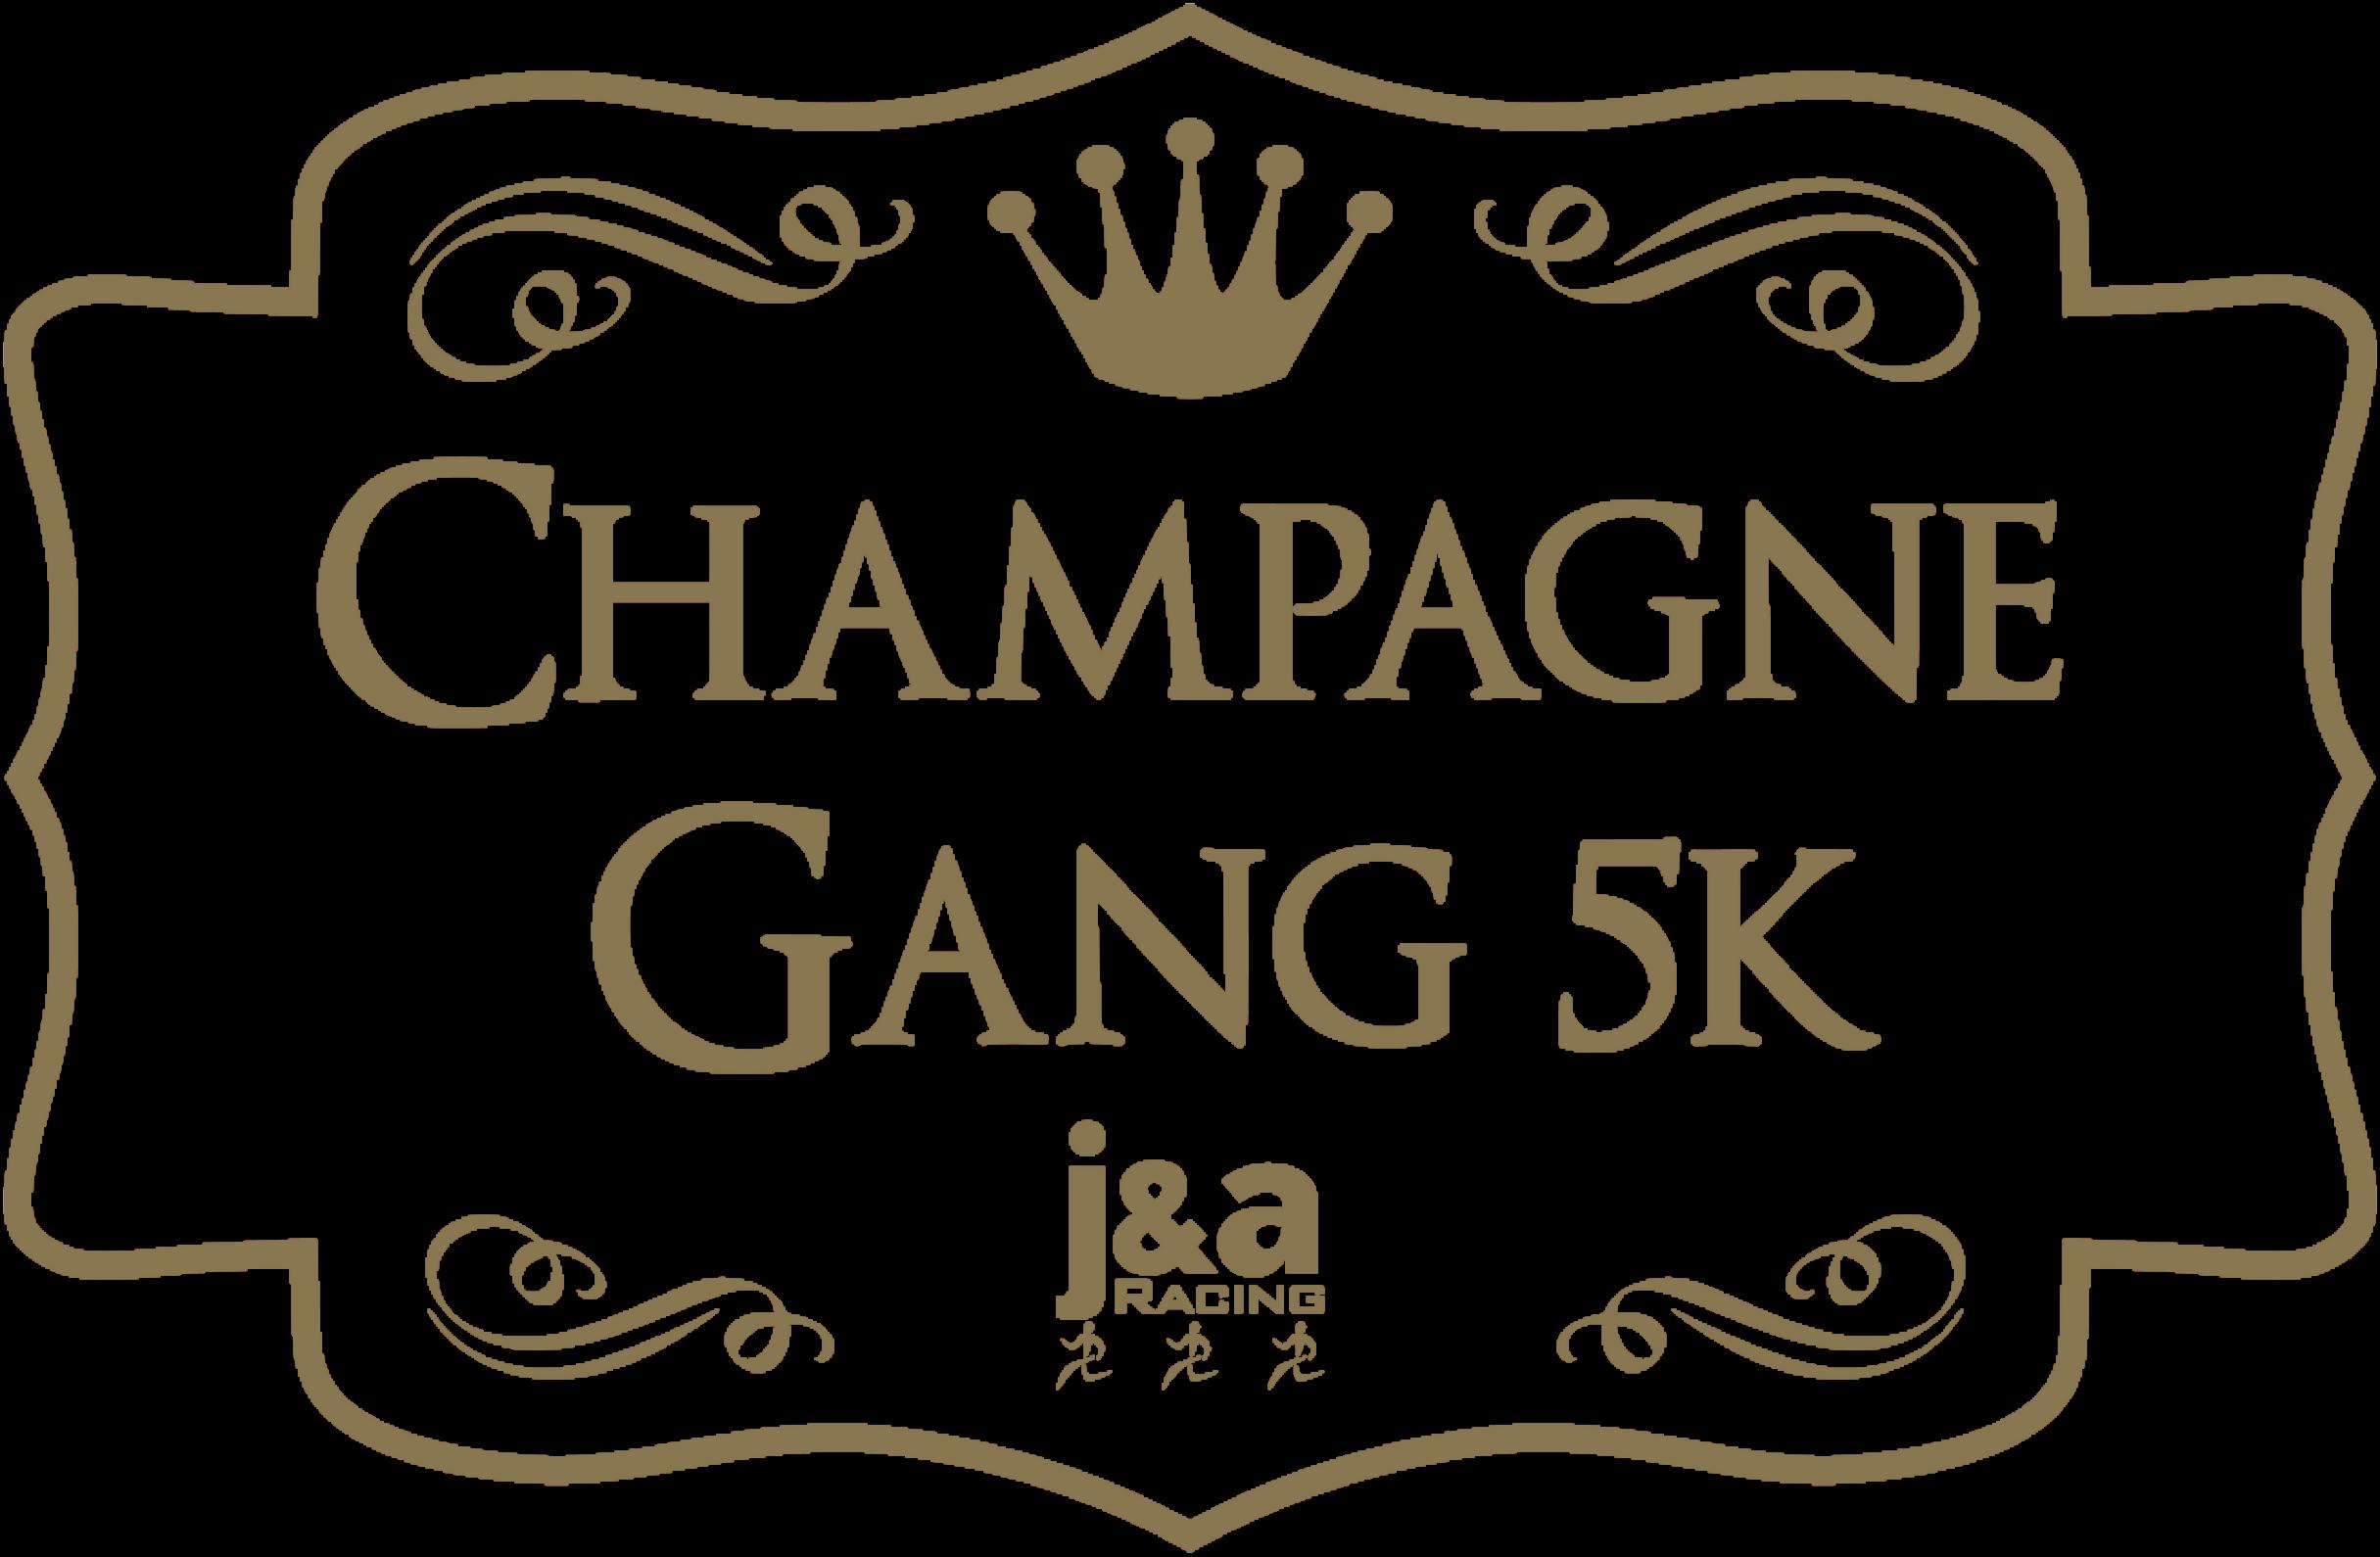 Champagne Gang 5K